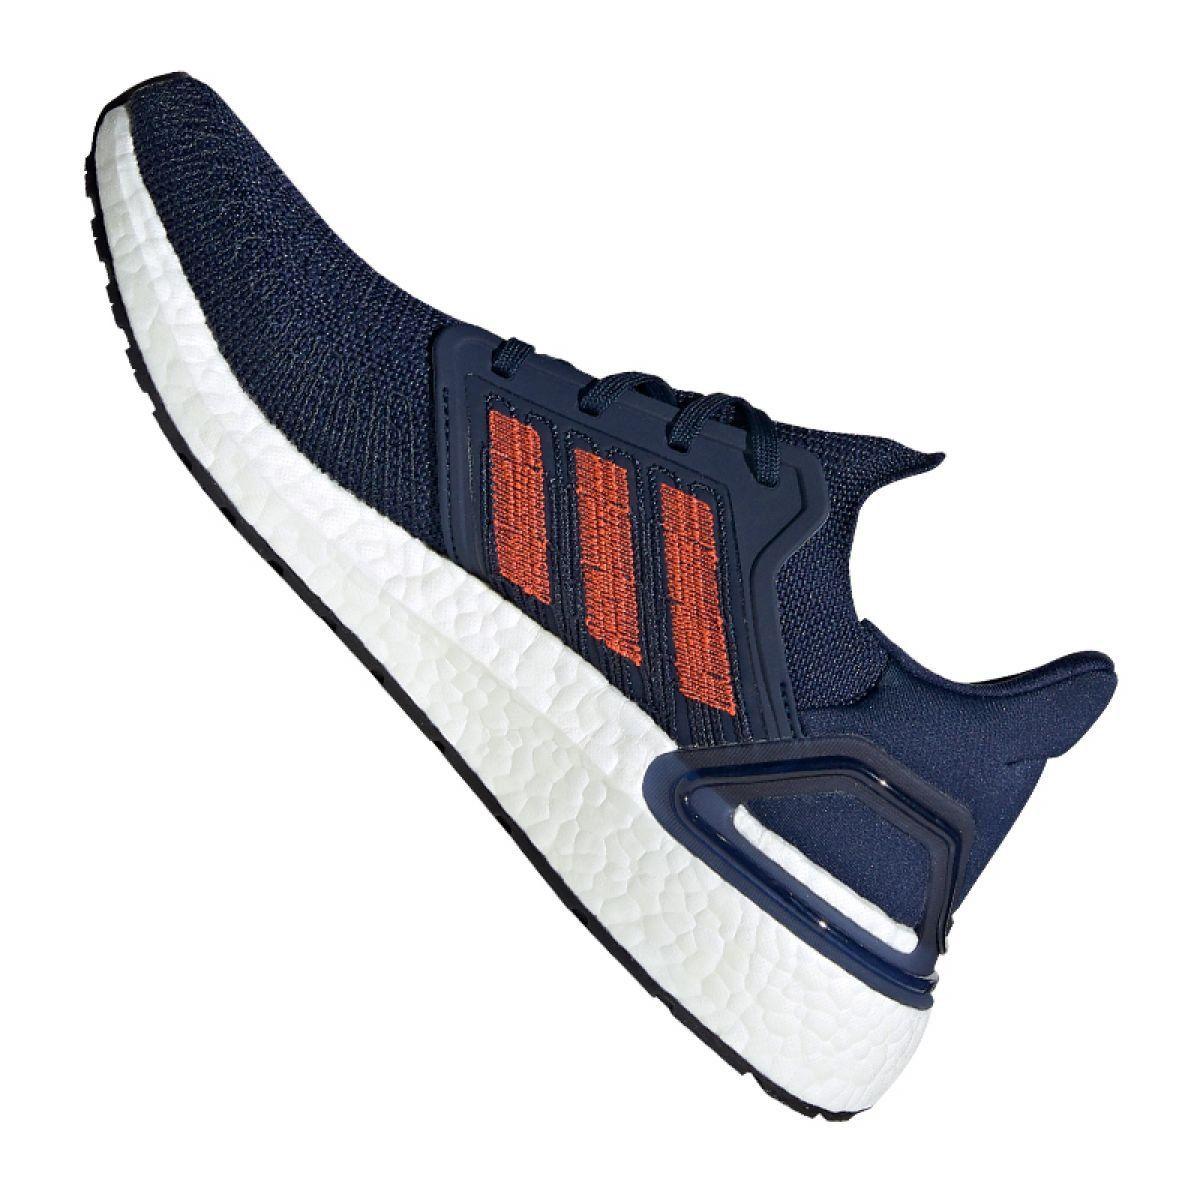 Buty Adidas Ultraboost 20 M Eg0693 Granatowe Adidas Sneakers Adidas Nike Free